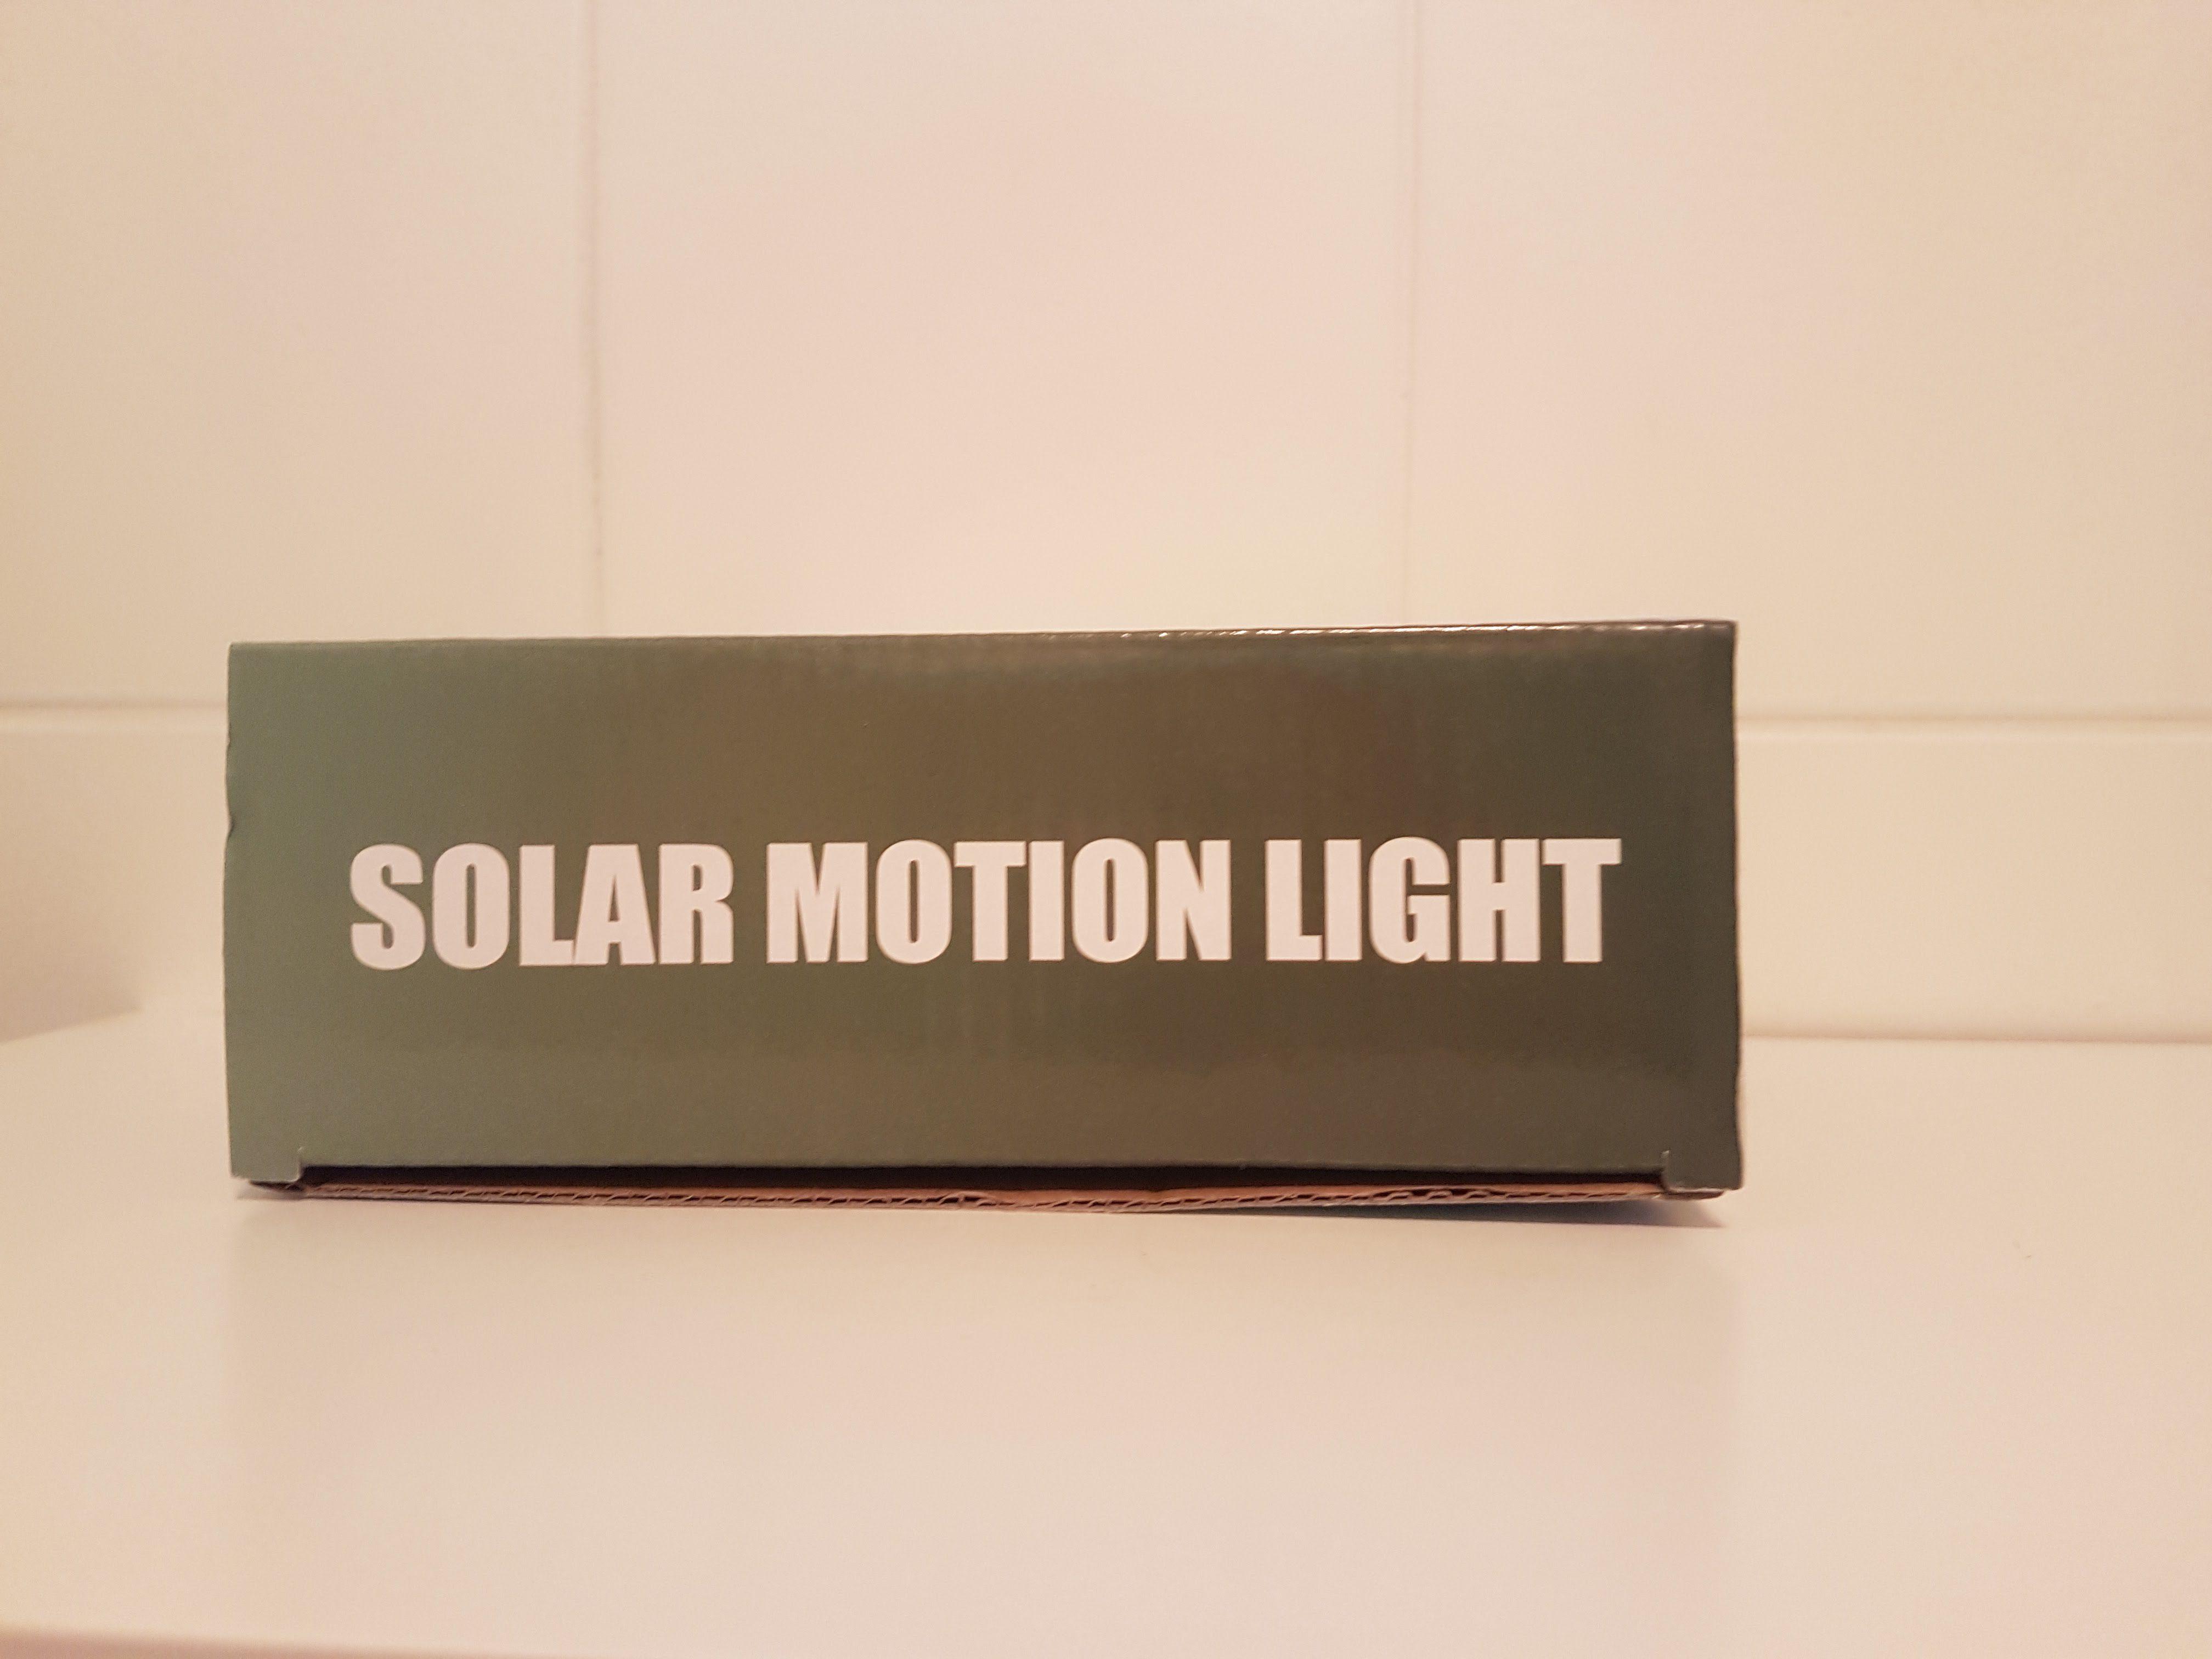 Matone-Lampe-Solaire - Matone-Lampe-Solaire-2.jpg